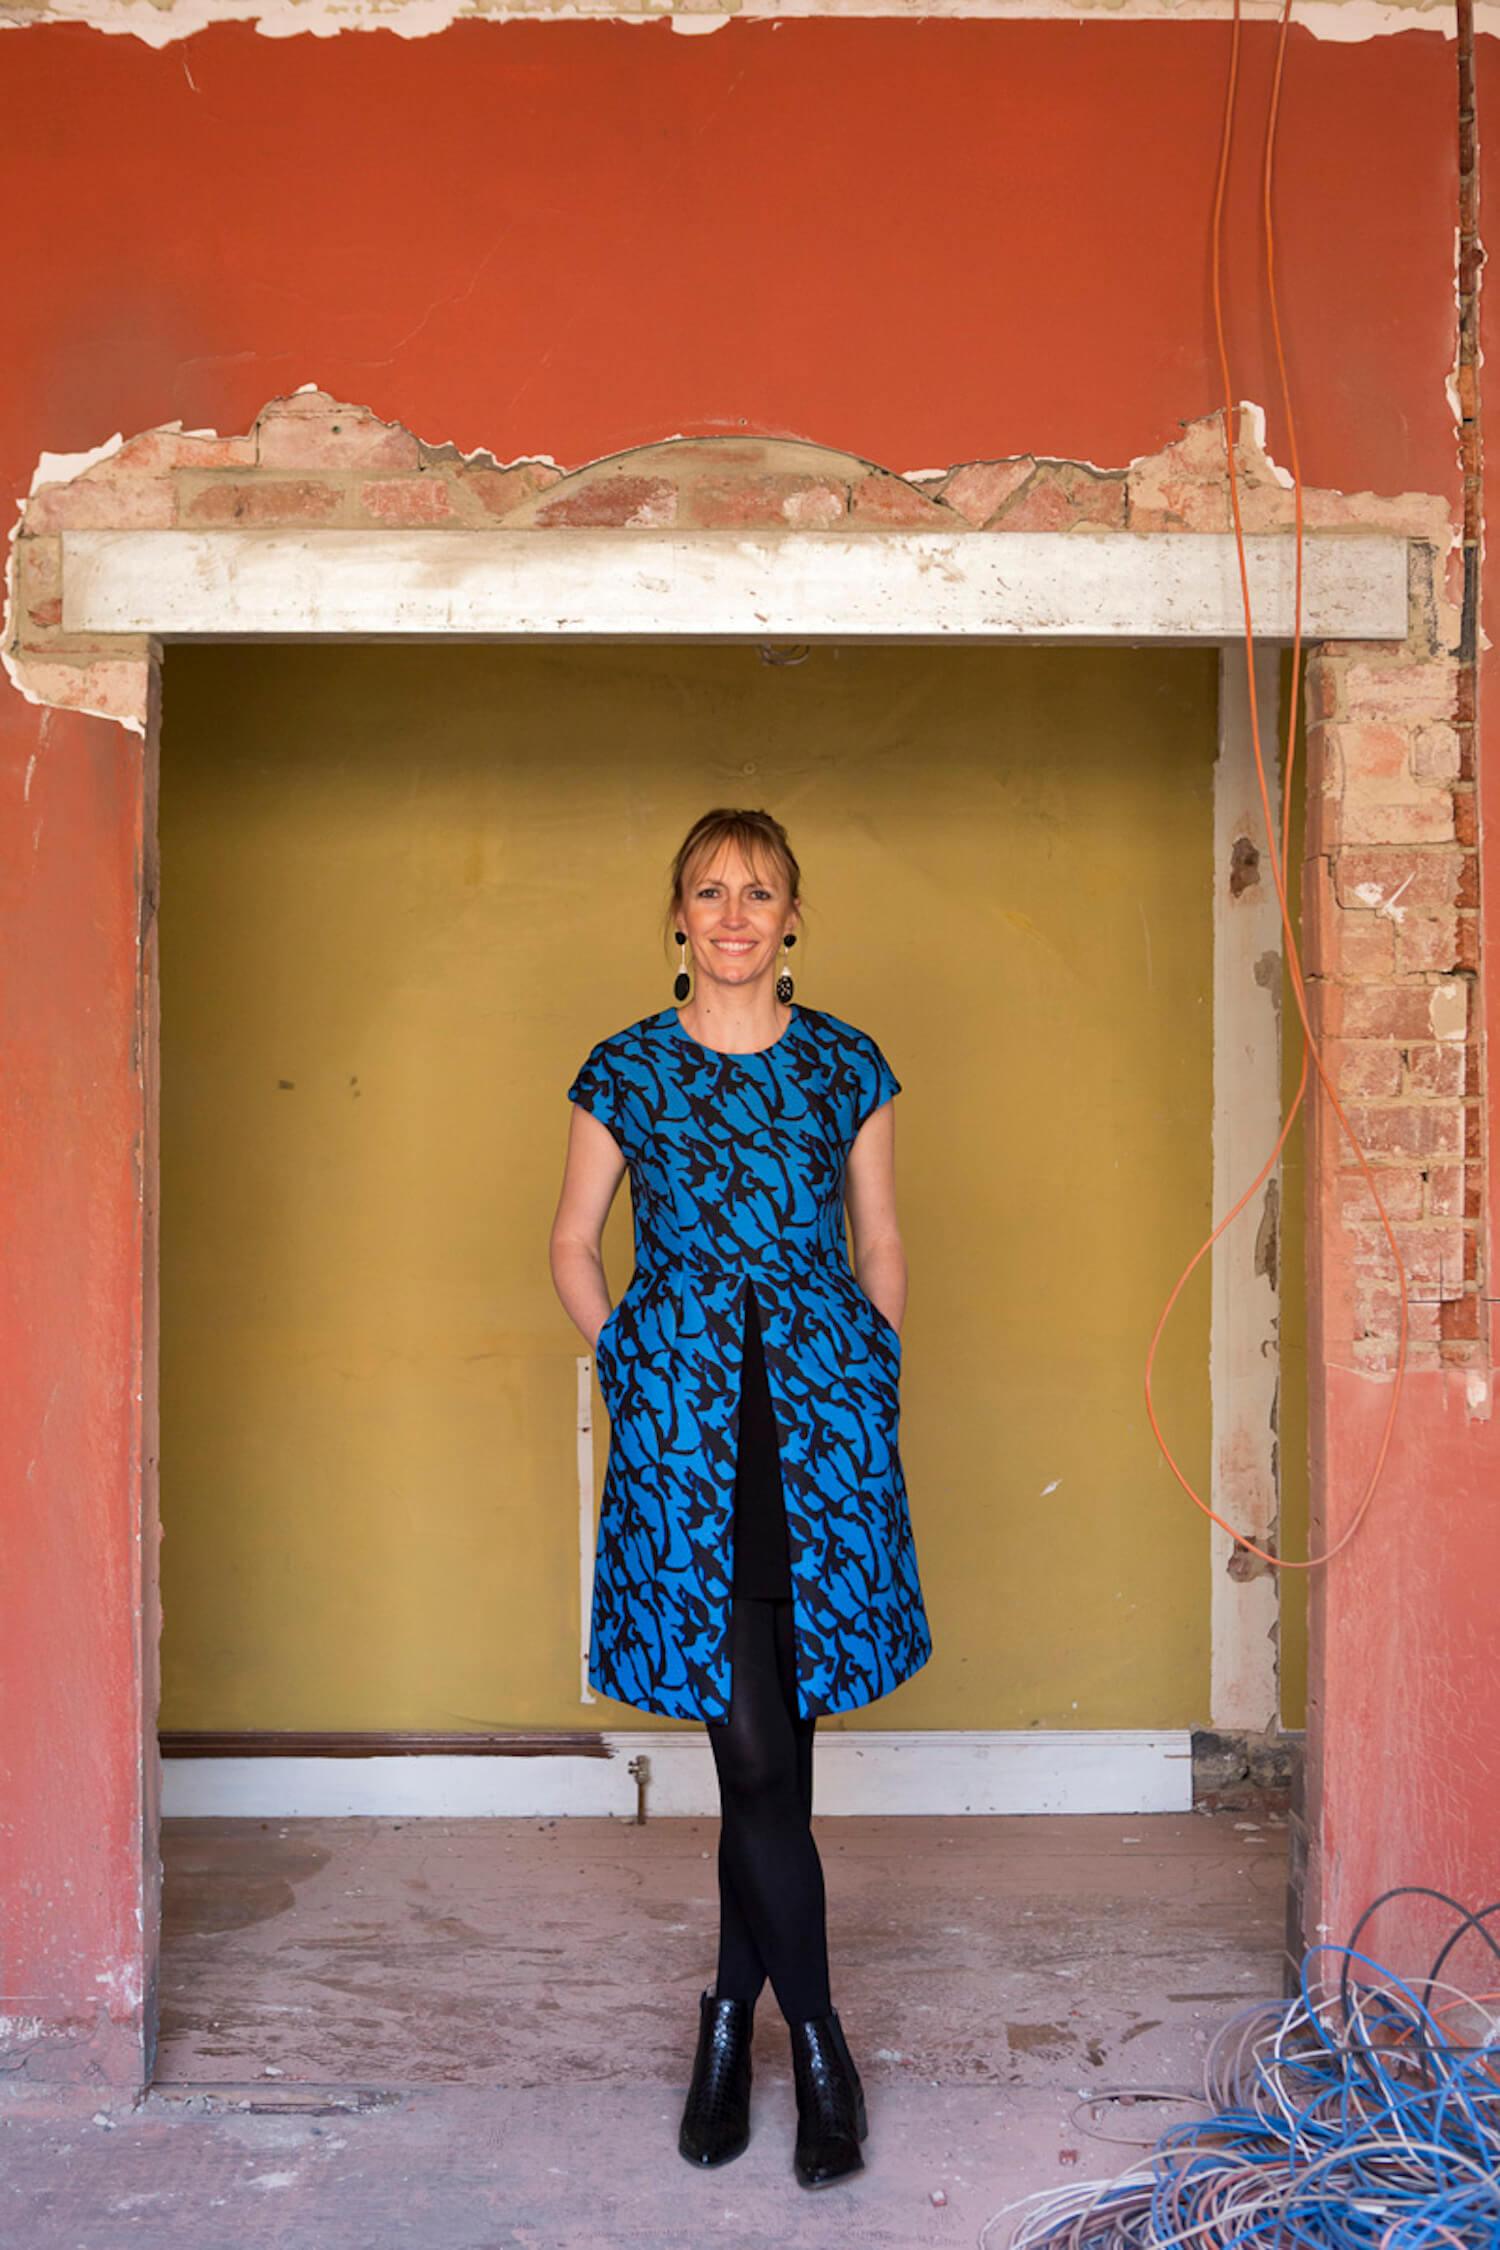 Mardi Doherty of Doherty Design Studio